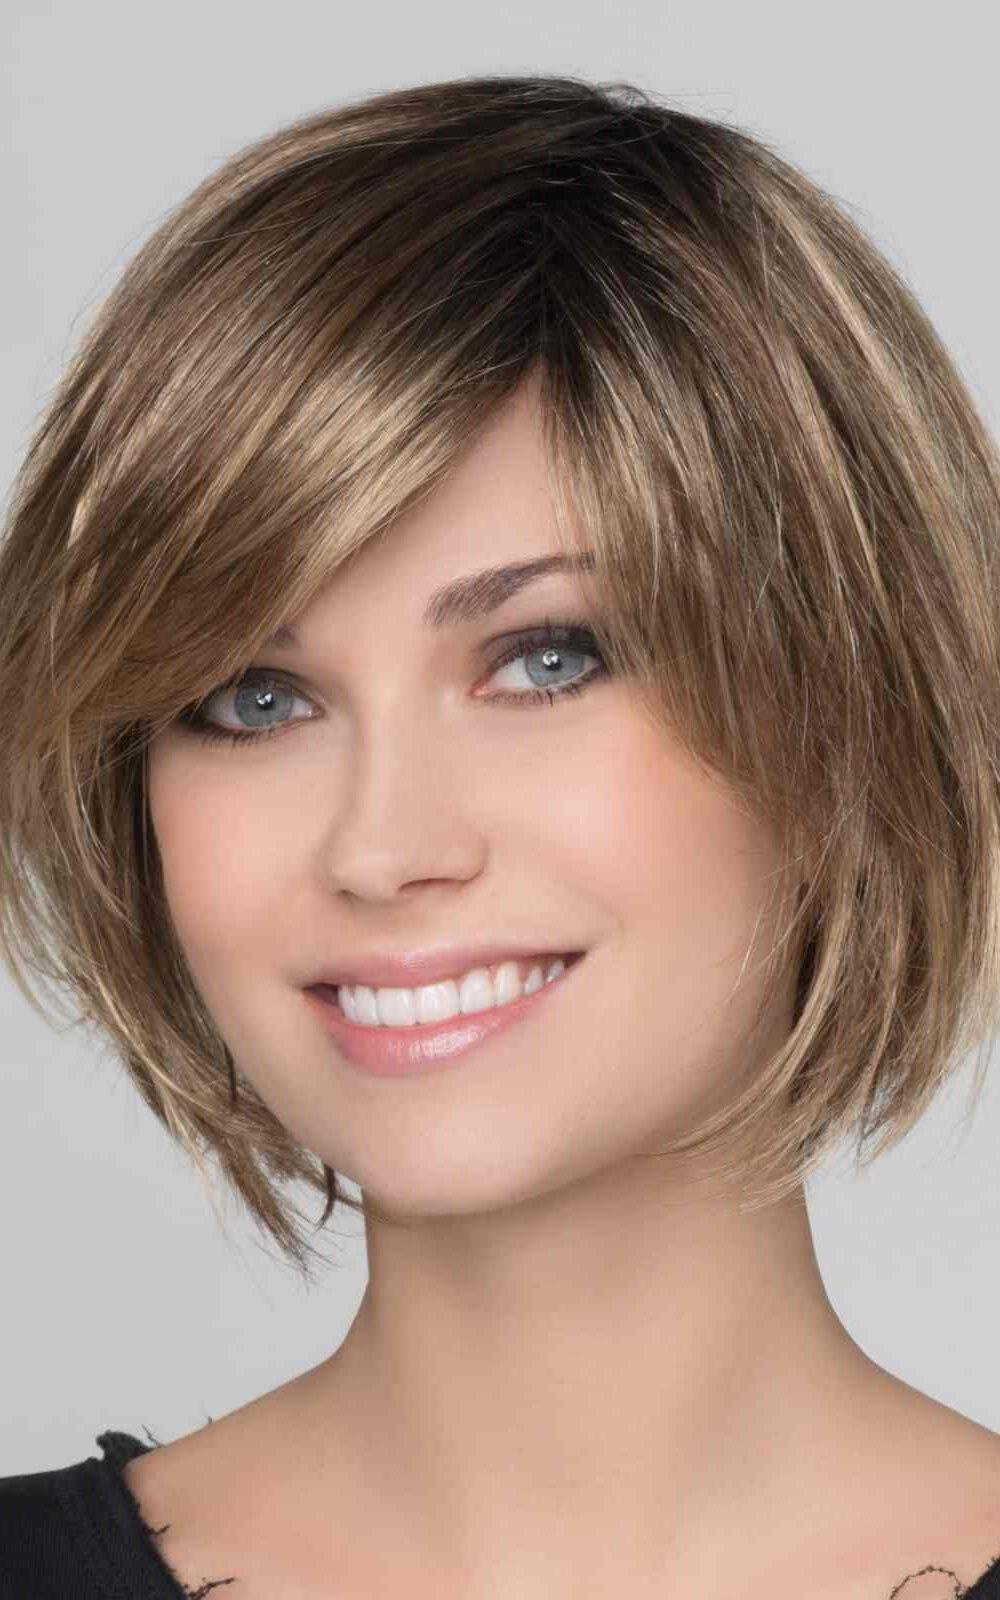 Fresh by Ellen Wille | Colour Light Bernstein Rooted | Light Auburn, Light Honey Blonde, and Light Reddish Brown blend with Dark Roots | Elly-K.com.au